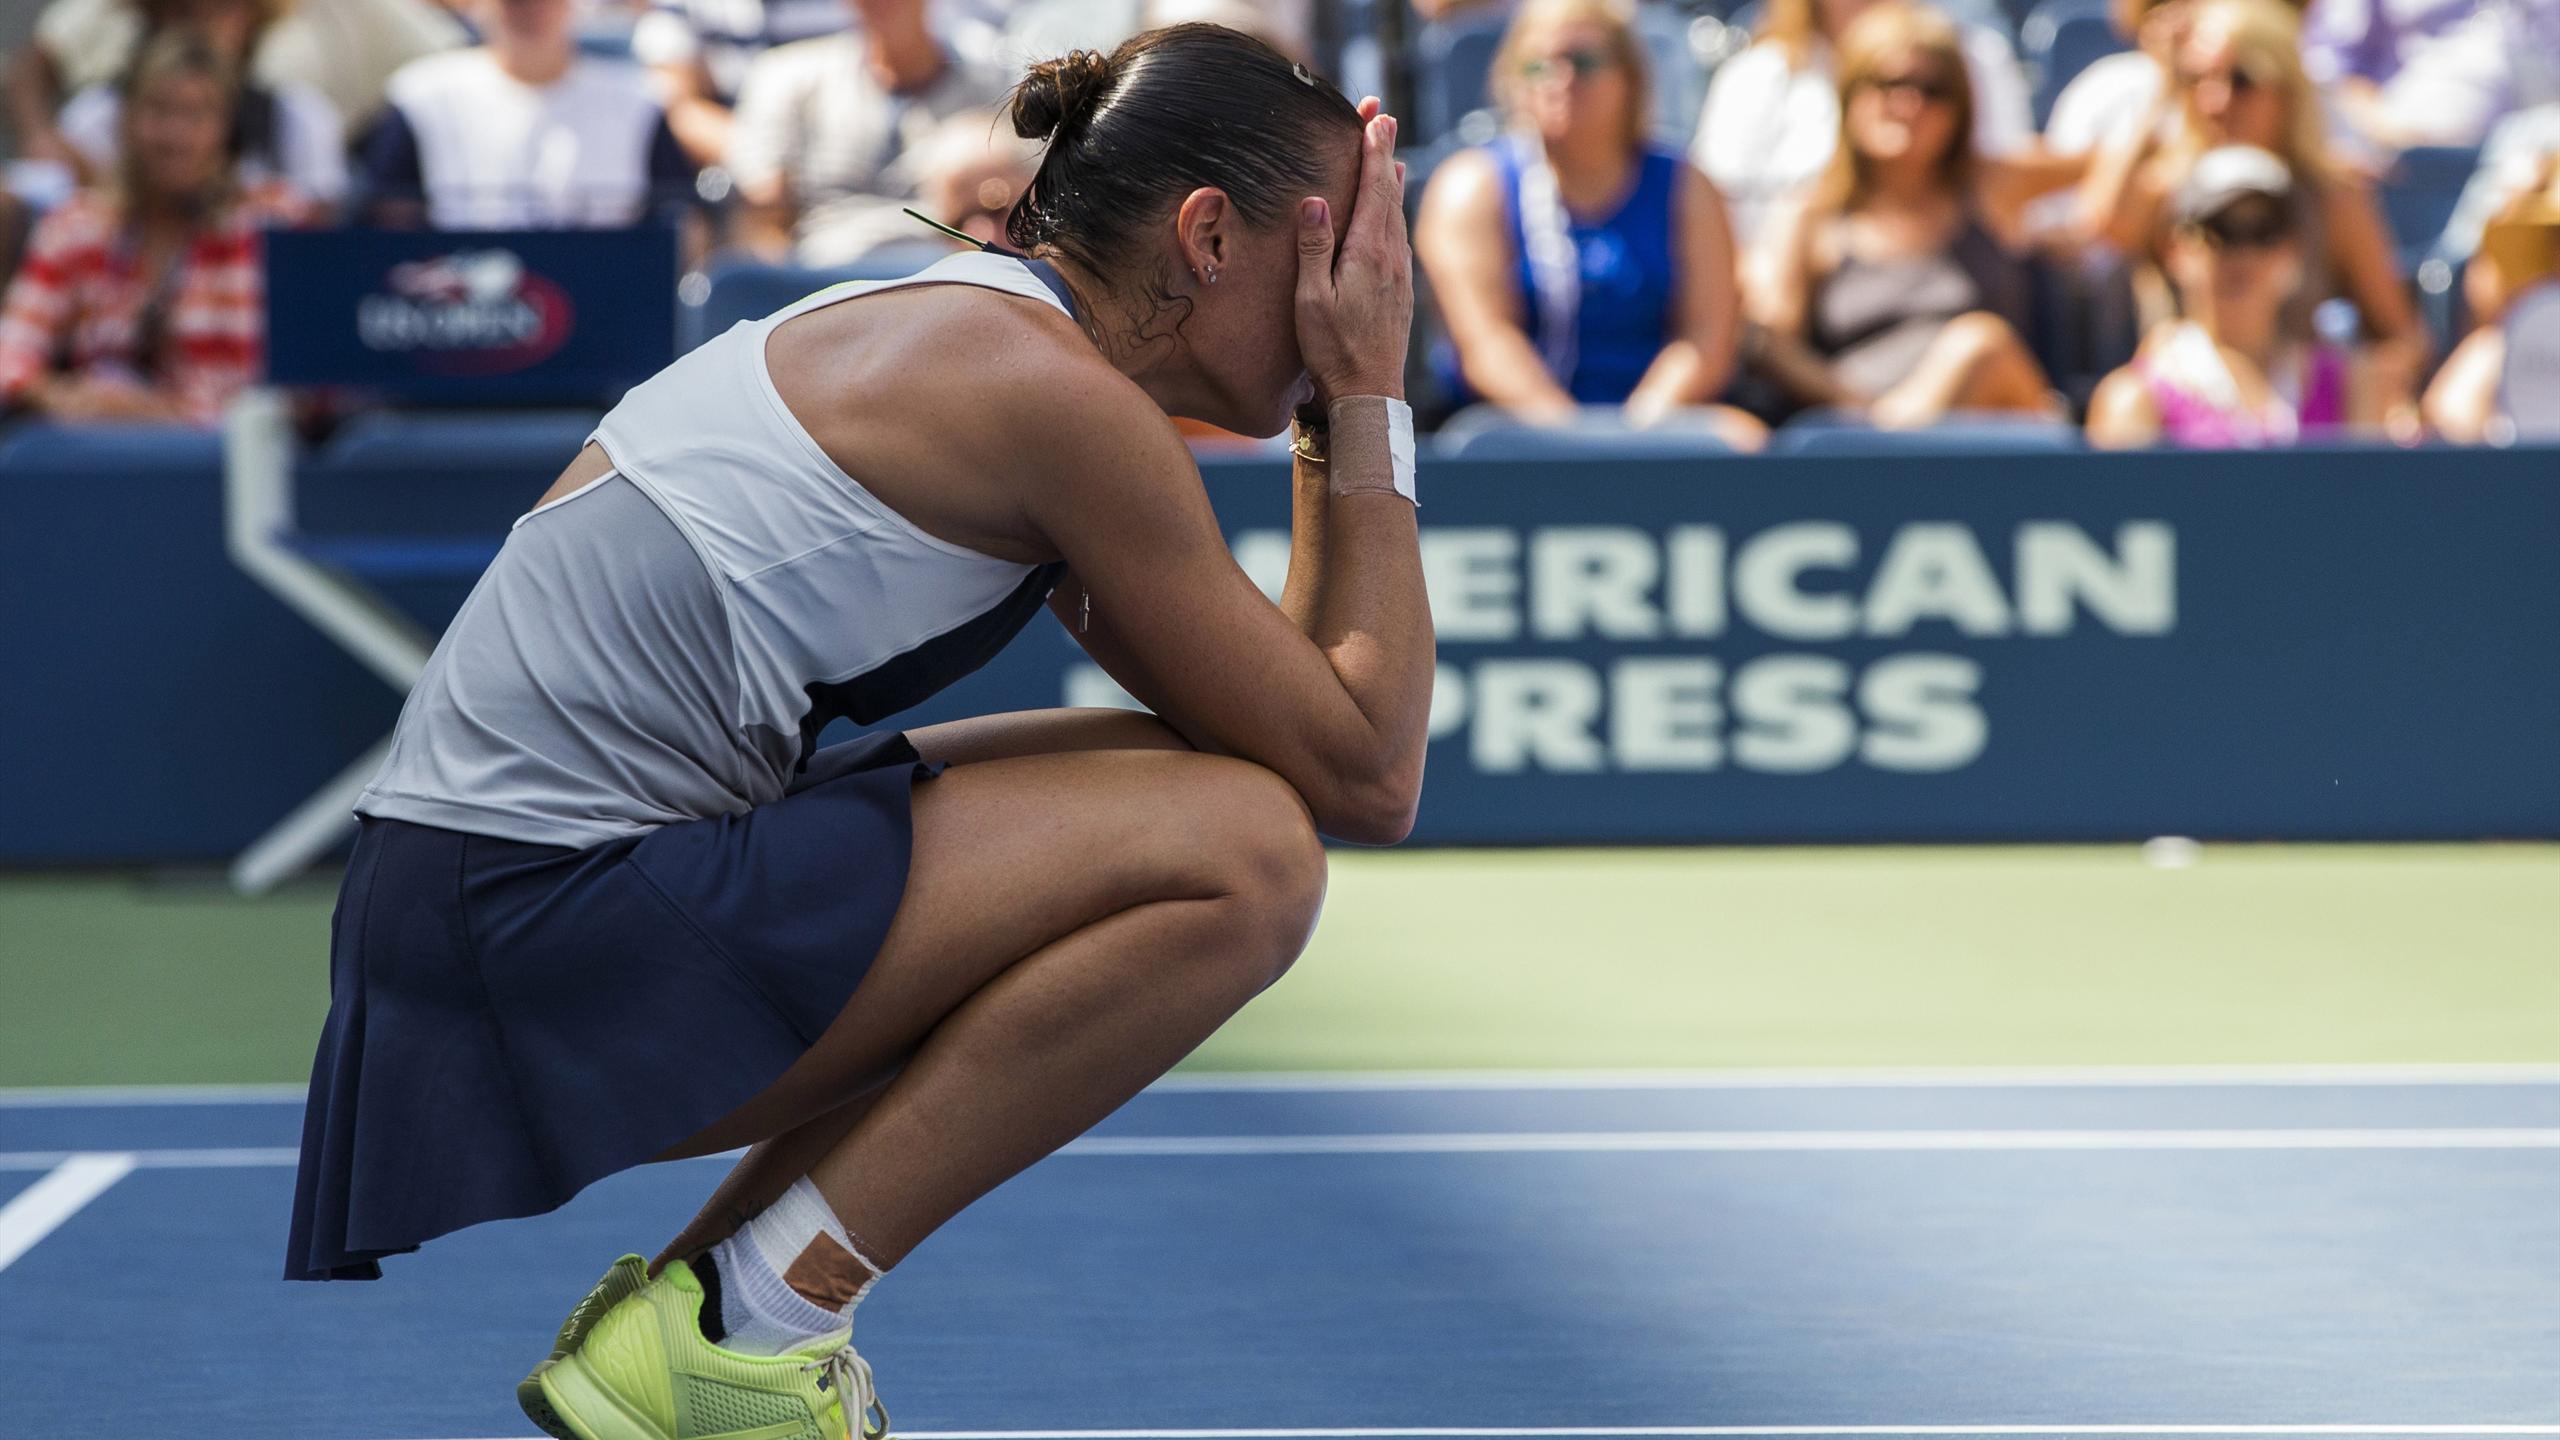 Flavia Pennetta reacts to a point against Petra Kvitova